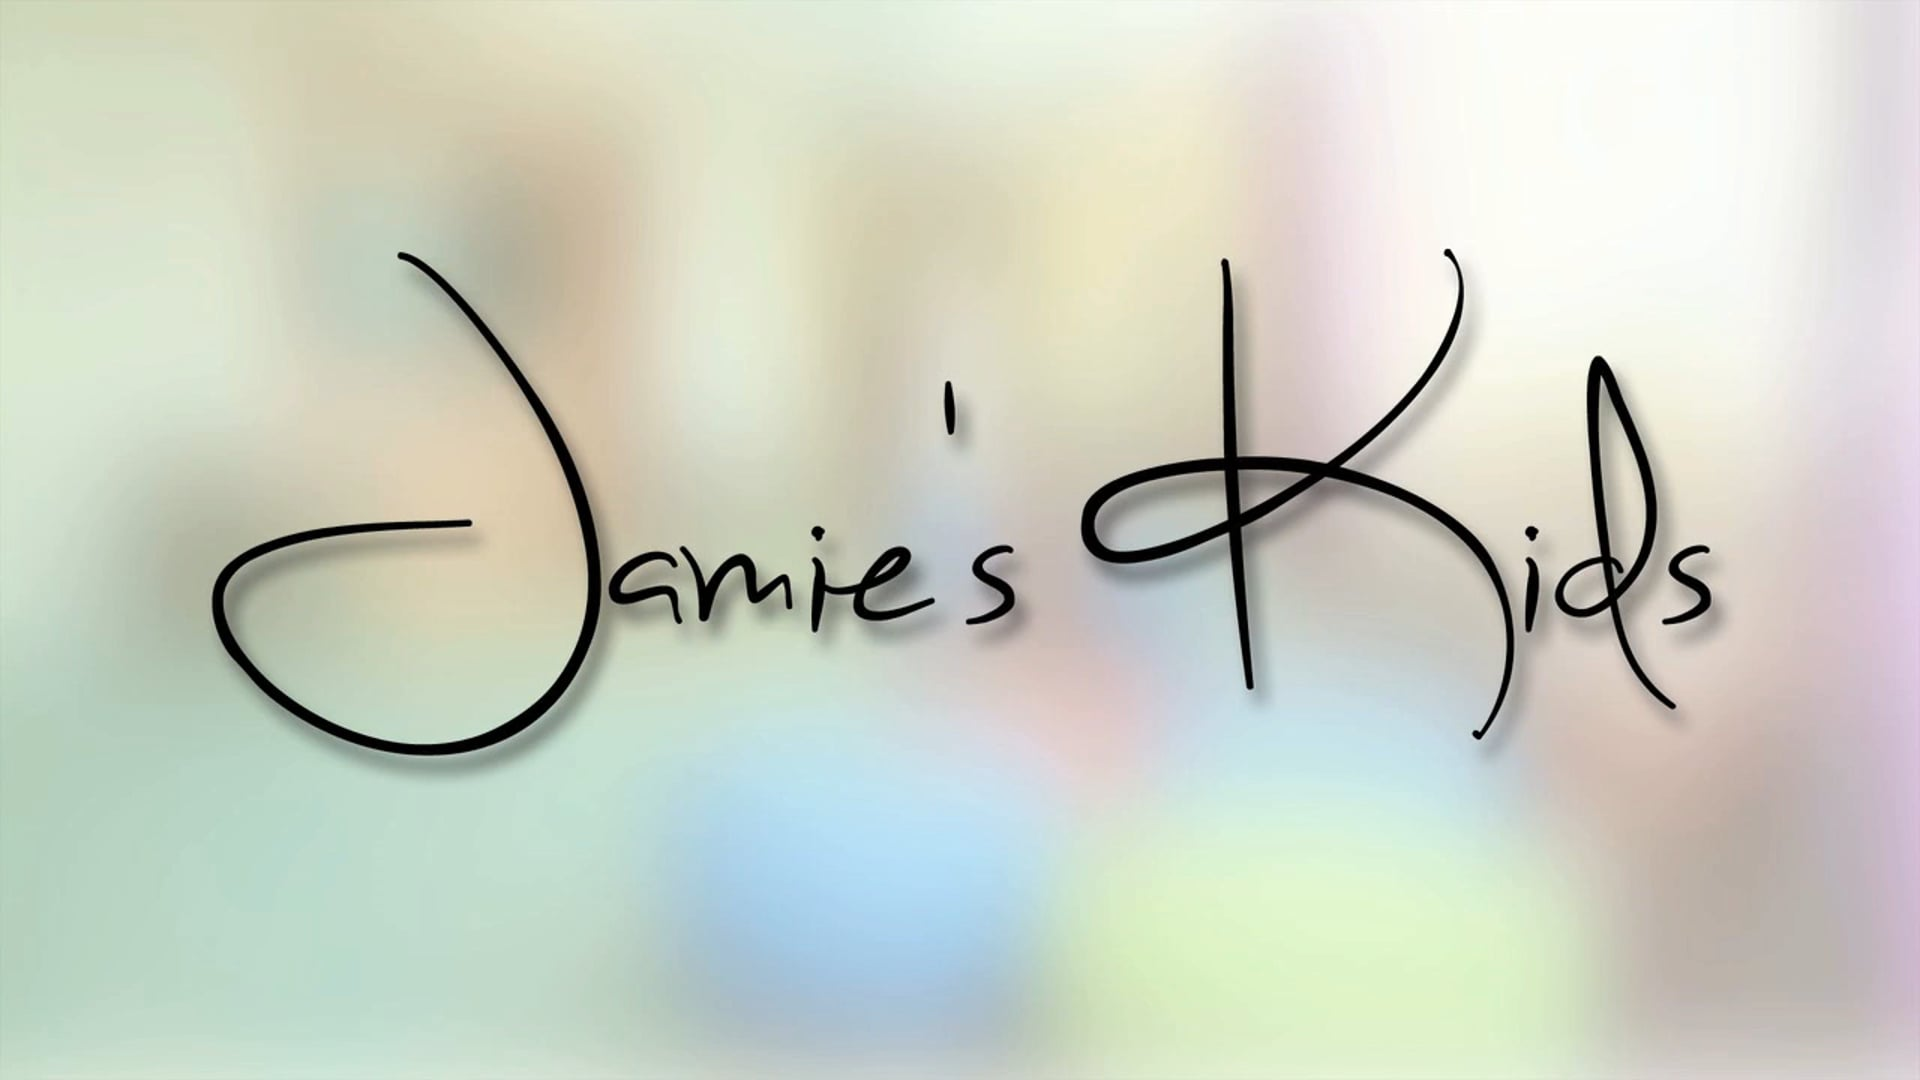 PPHC Jamie's Kids